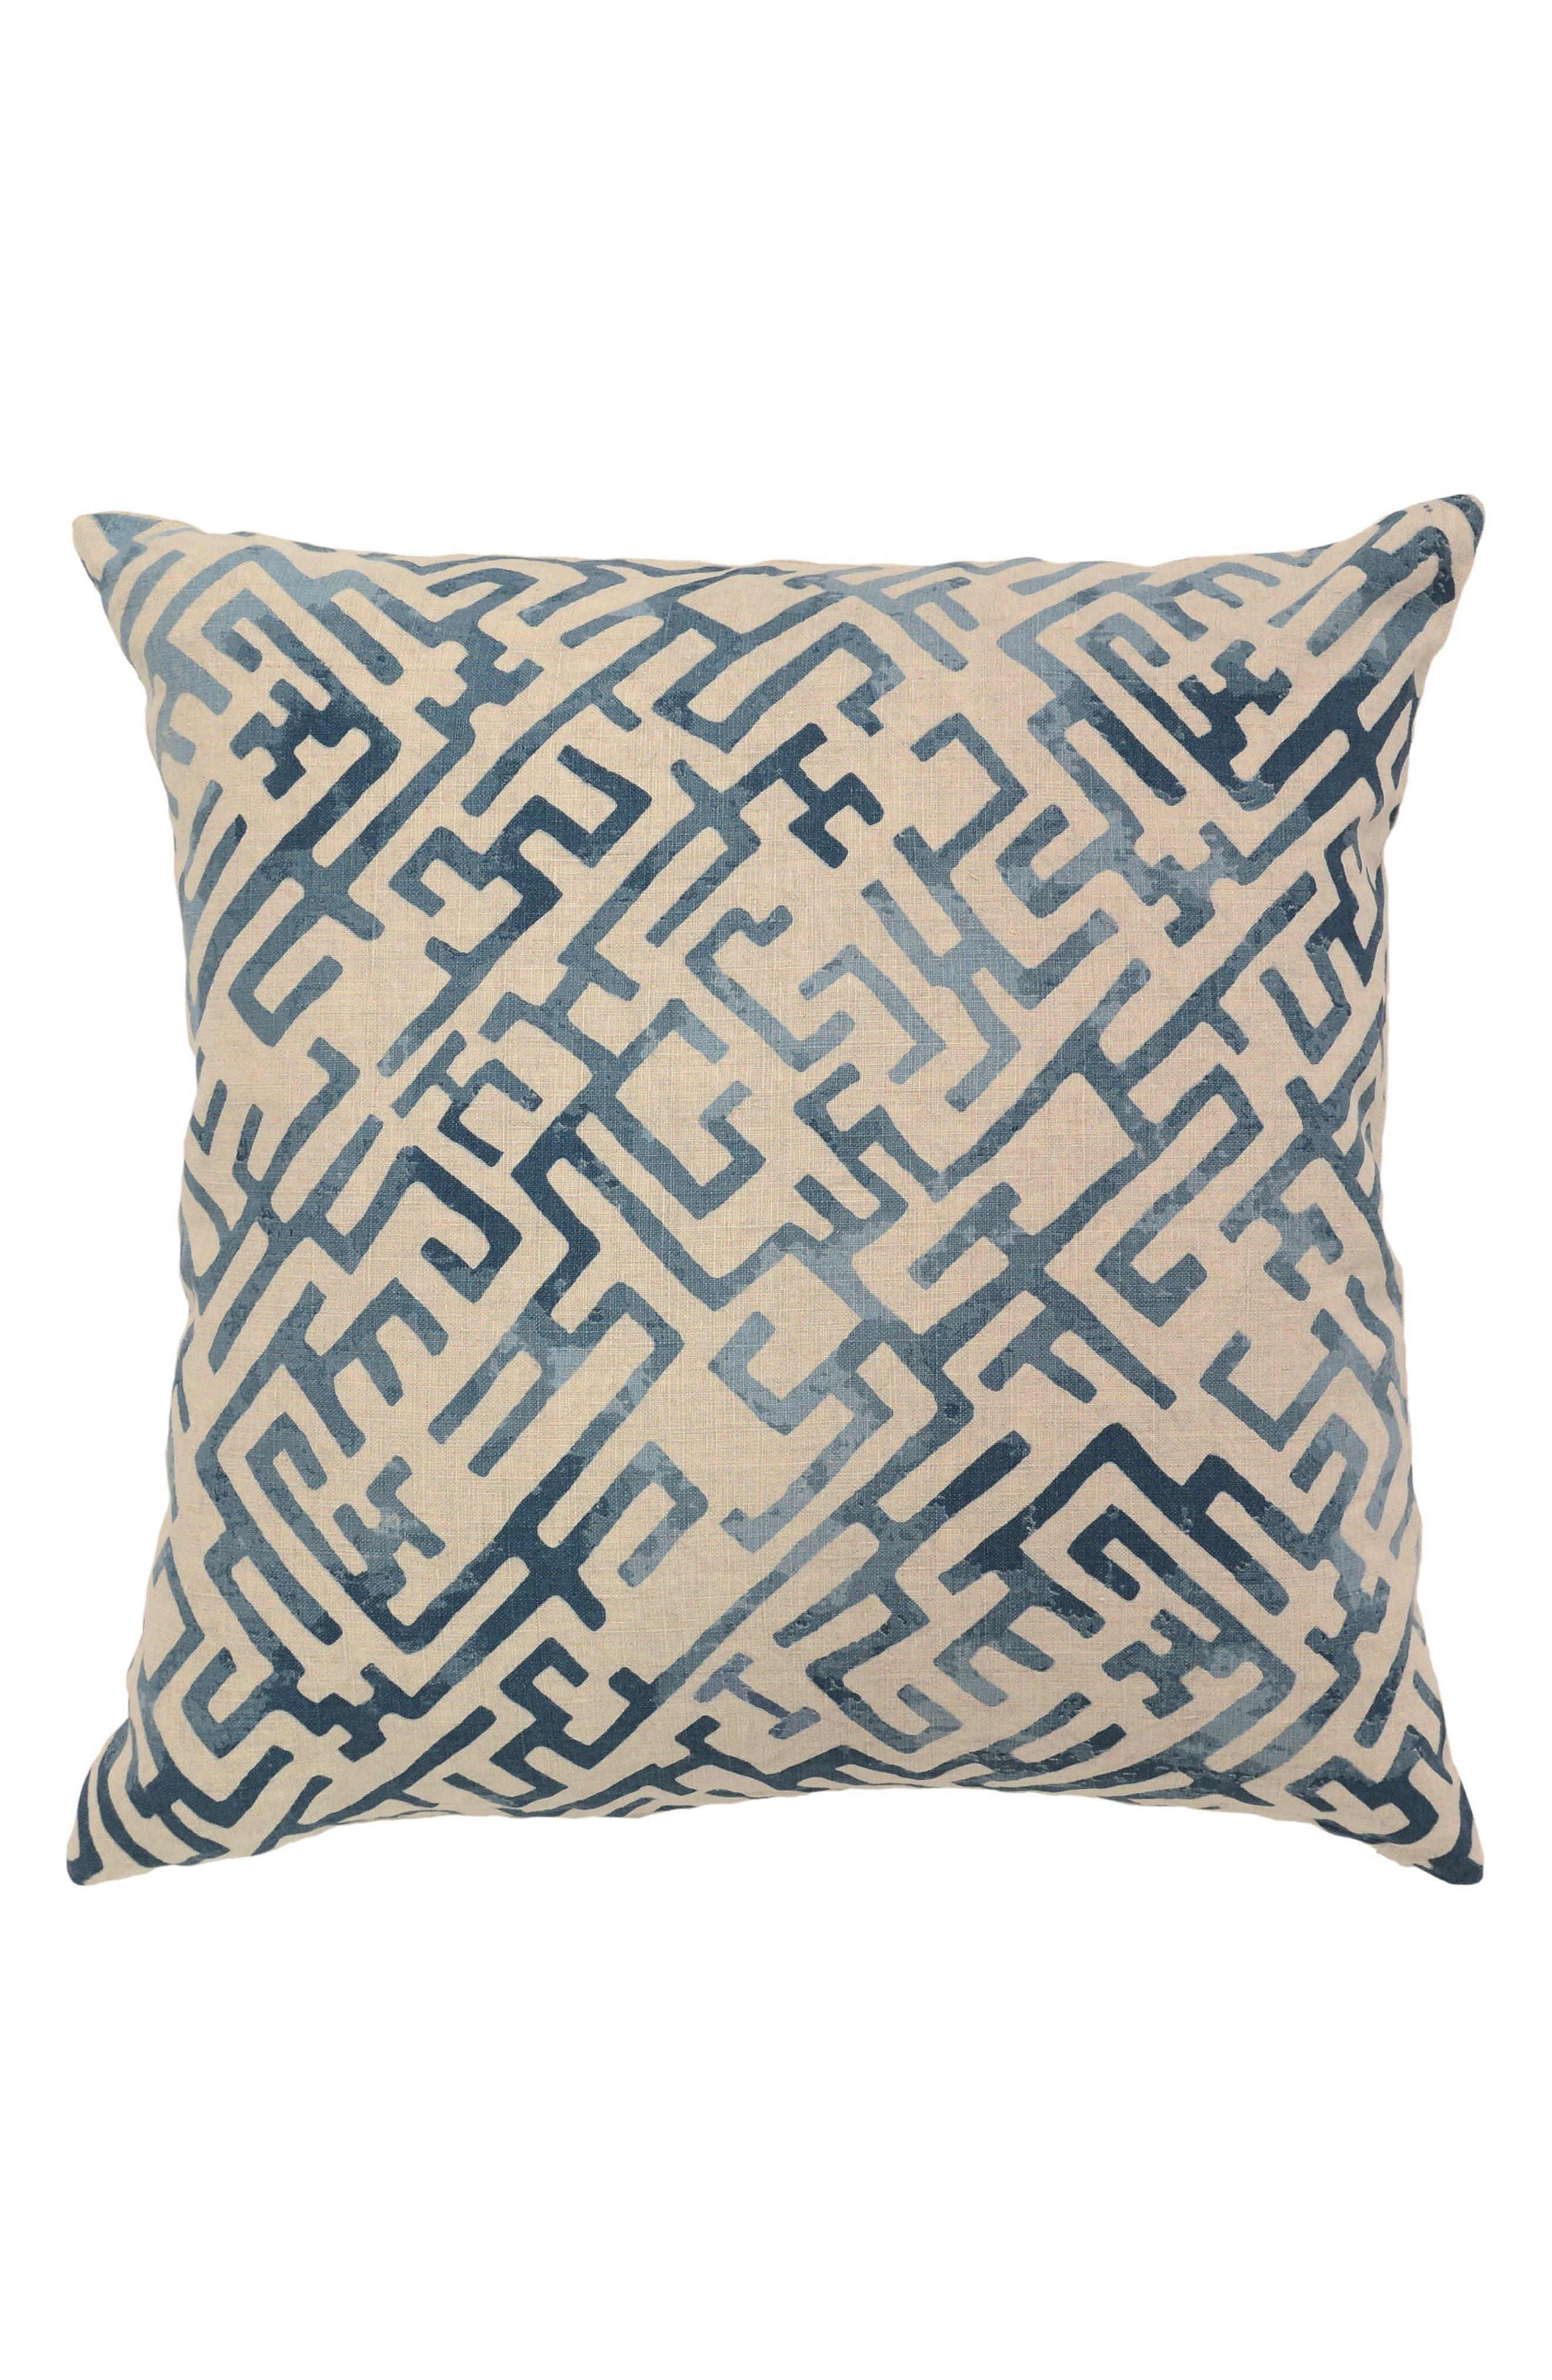 Alternate Image 1 Selected - Villa Home Collection Marin Pillow